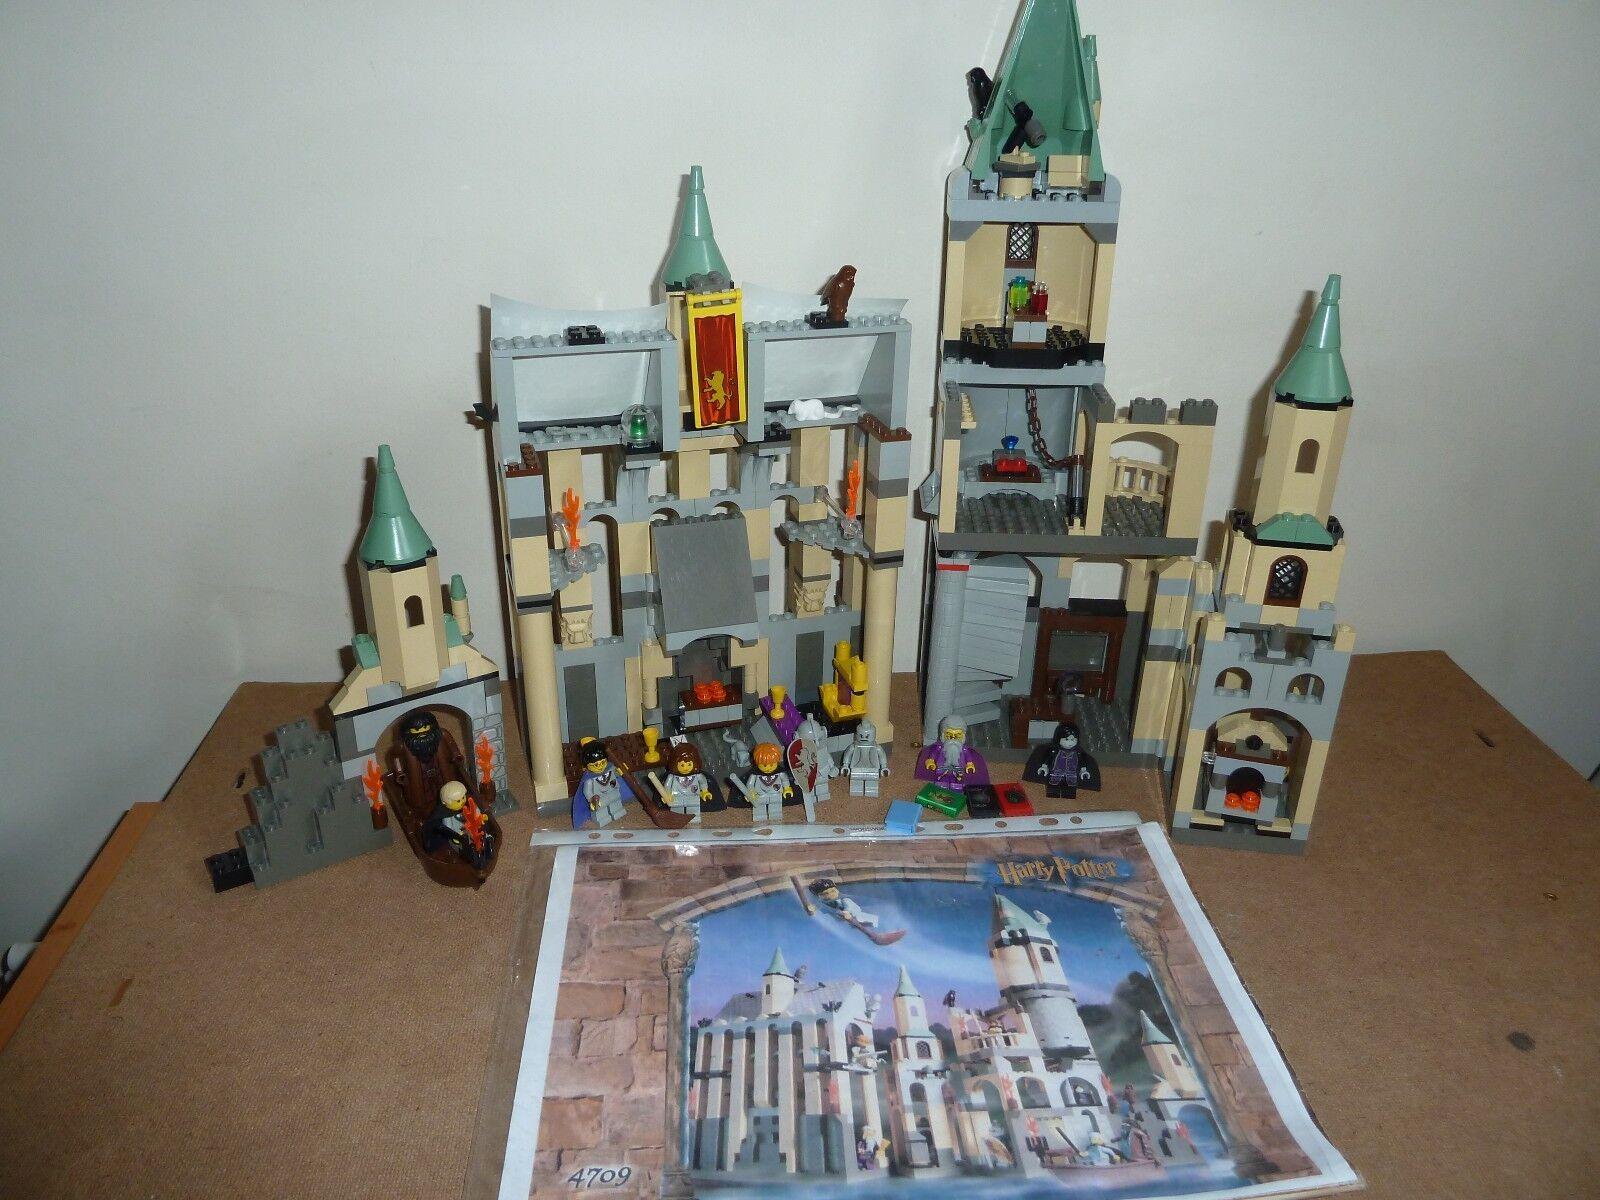 LEGO HARRY POTTER  4709 HOGWARTS CASTLE RARE 1ST EDITION 9 FIGURES INSTRUCTIONS